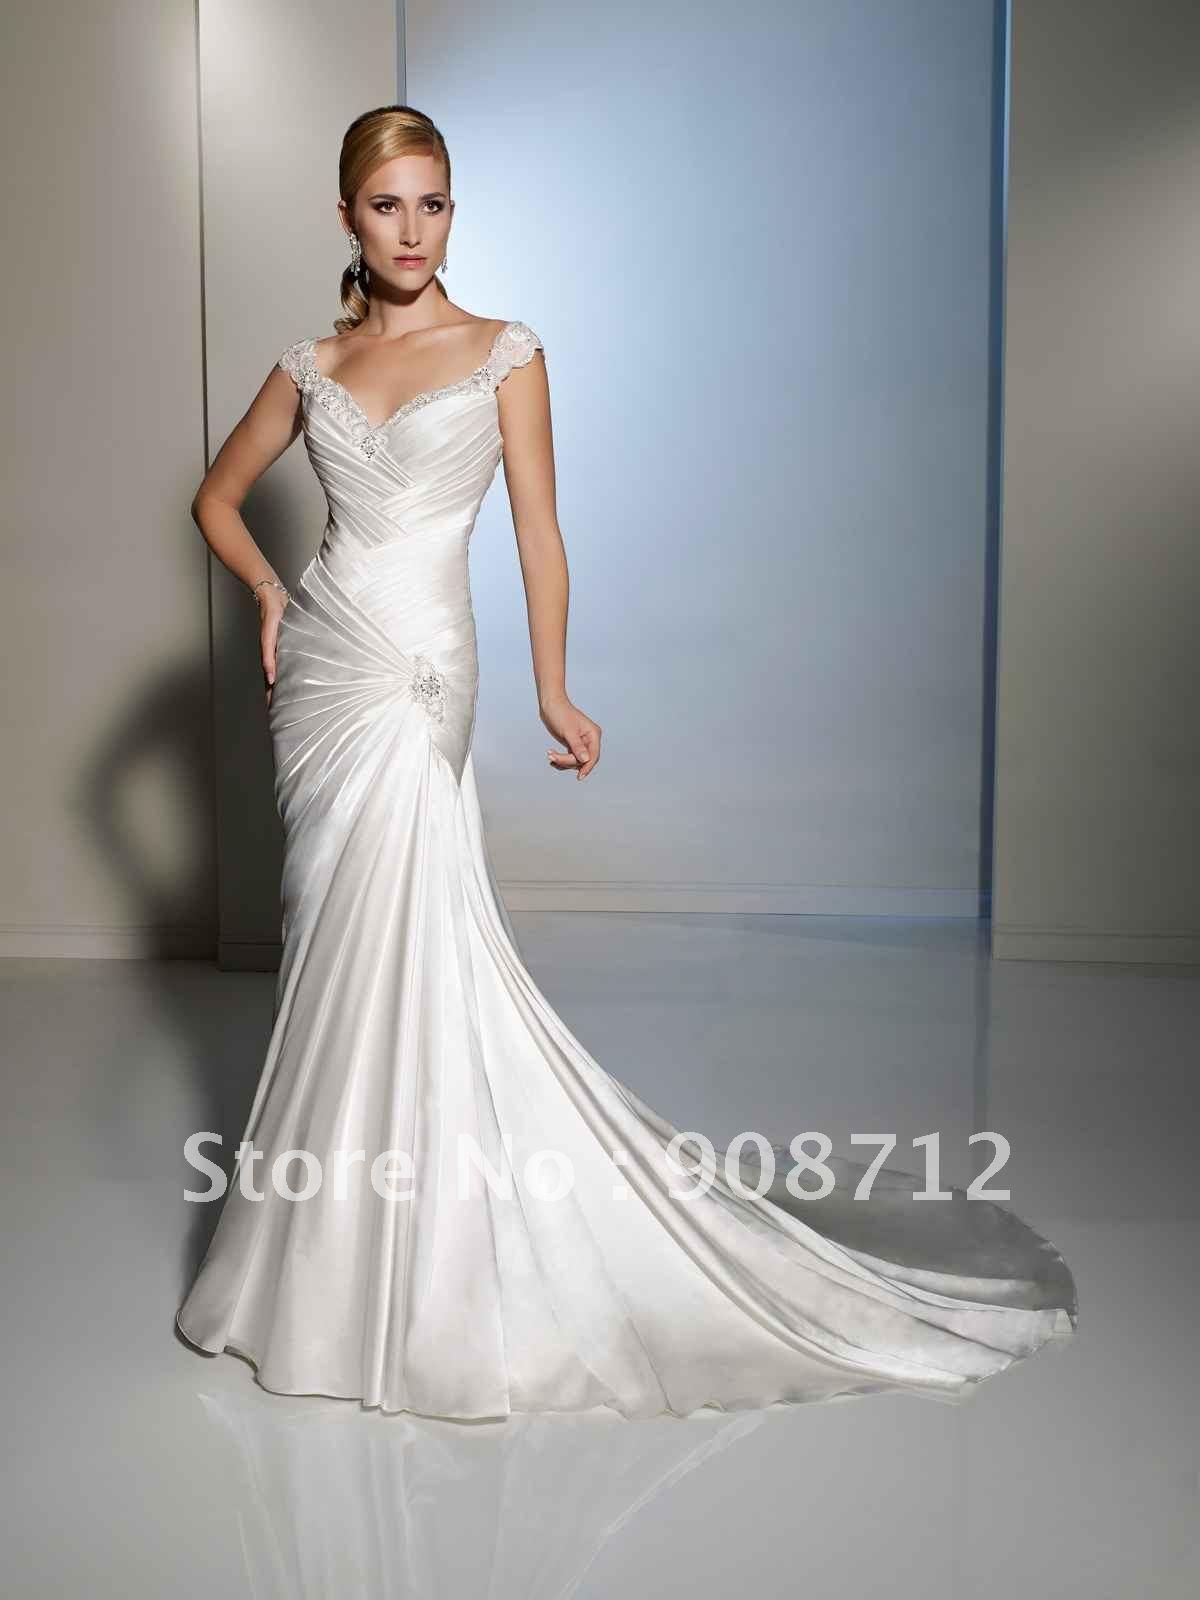 designer mermaid wedding dresses - Dress Yp